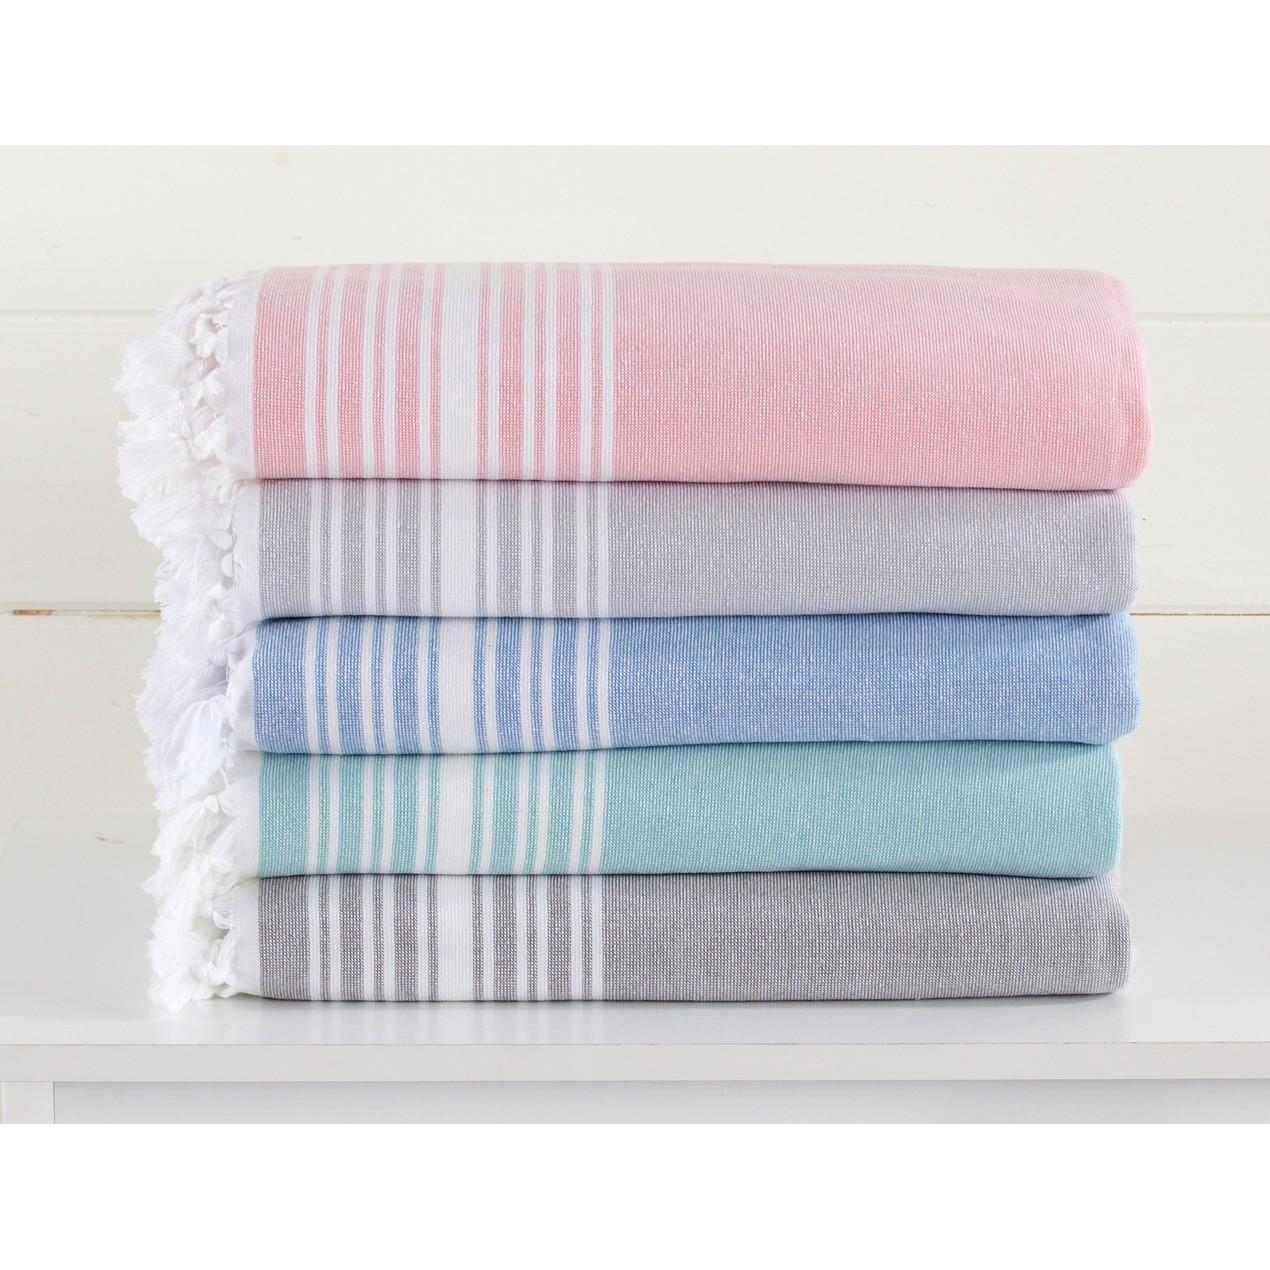 Blossom Linens 100% Cotton Beach Towel and Oversize Bath Towel - Tanga